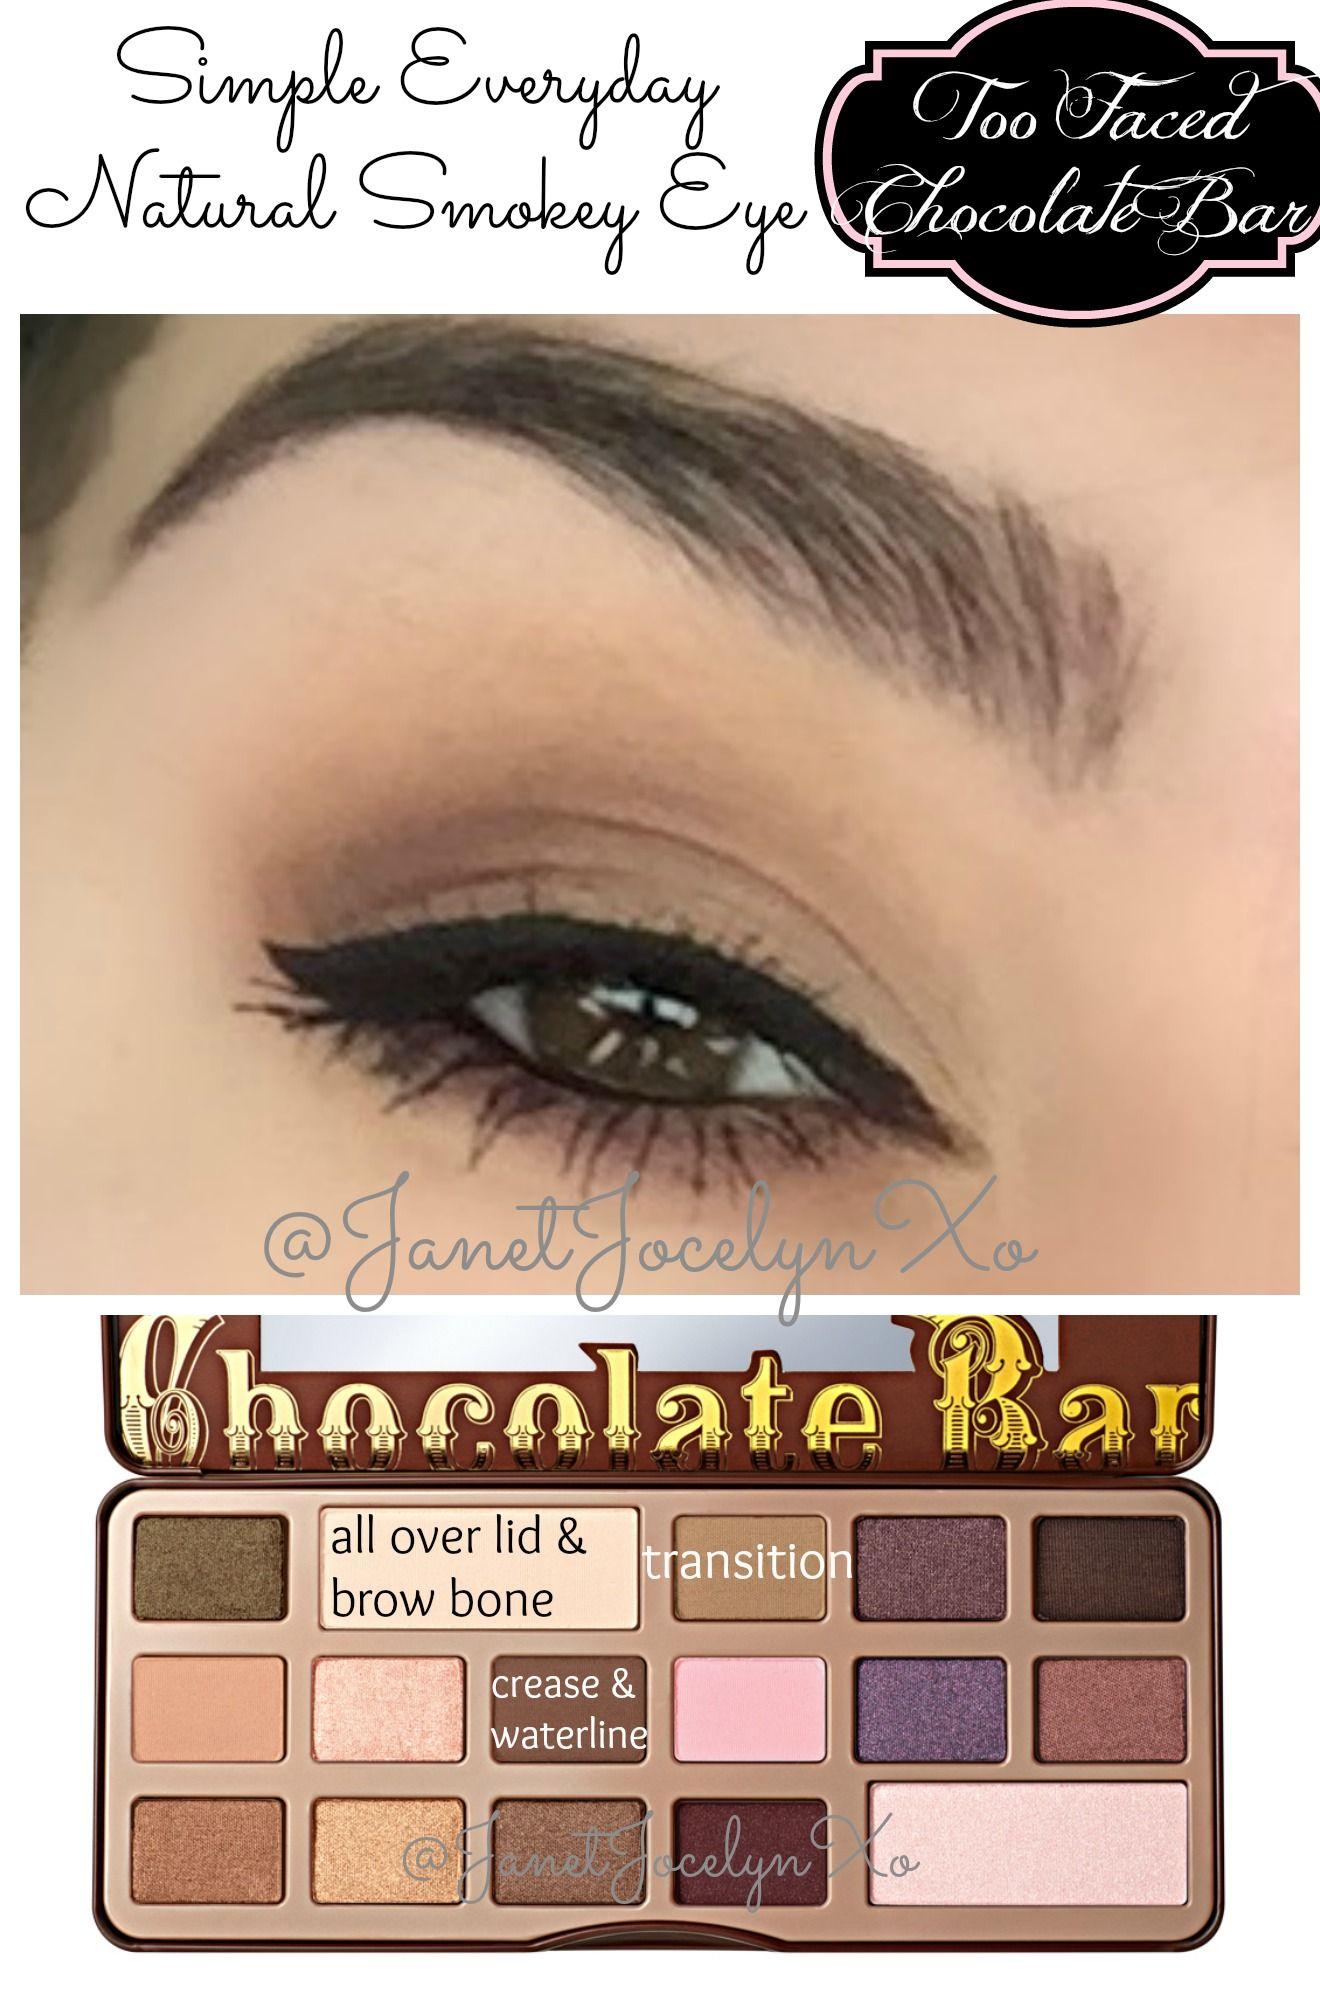 Everyday Natural Smokey Eye Too Faced Chocolate Bar